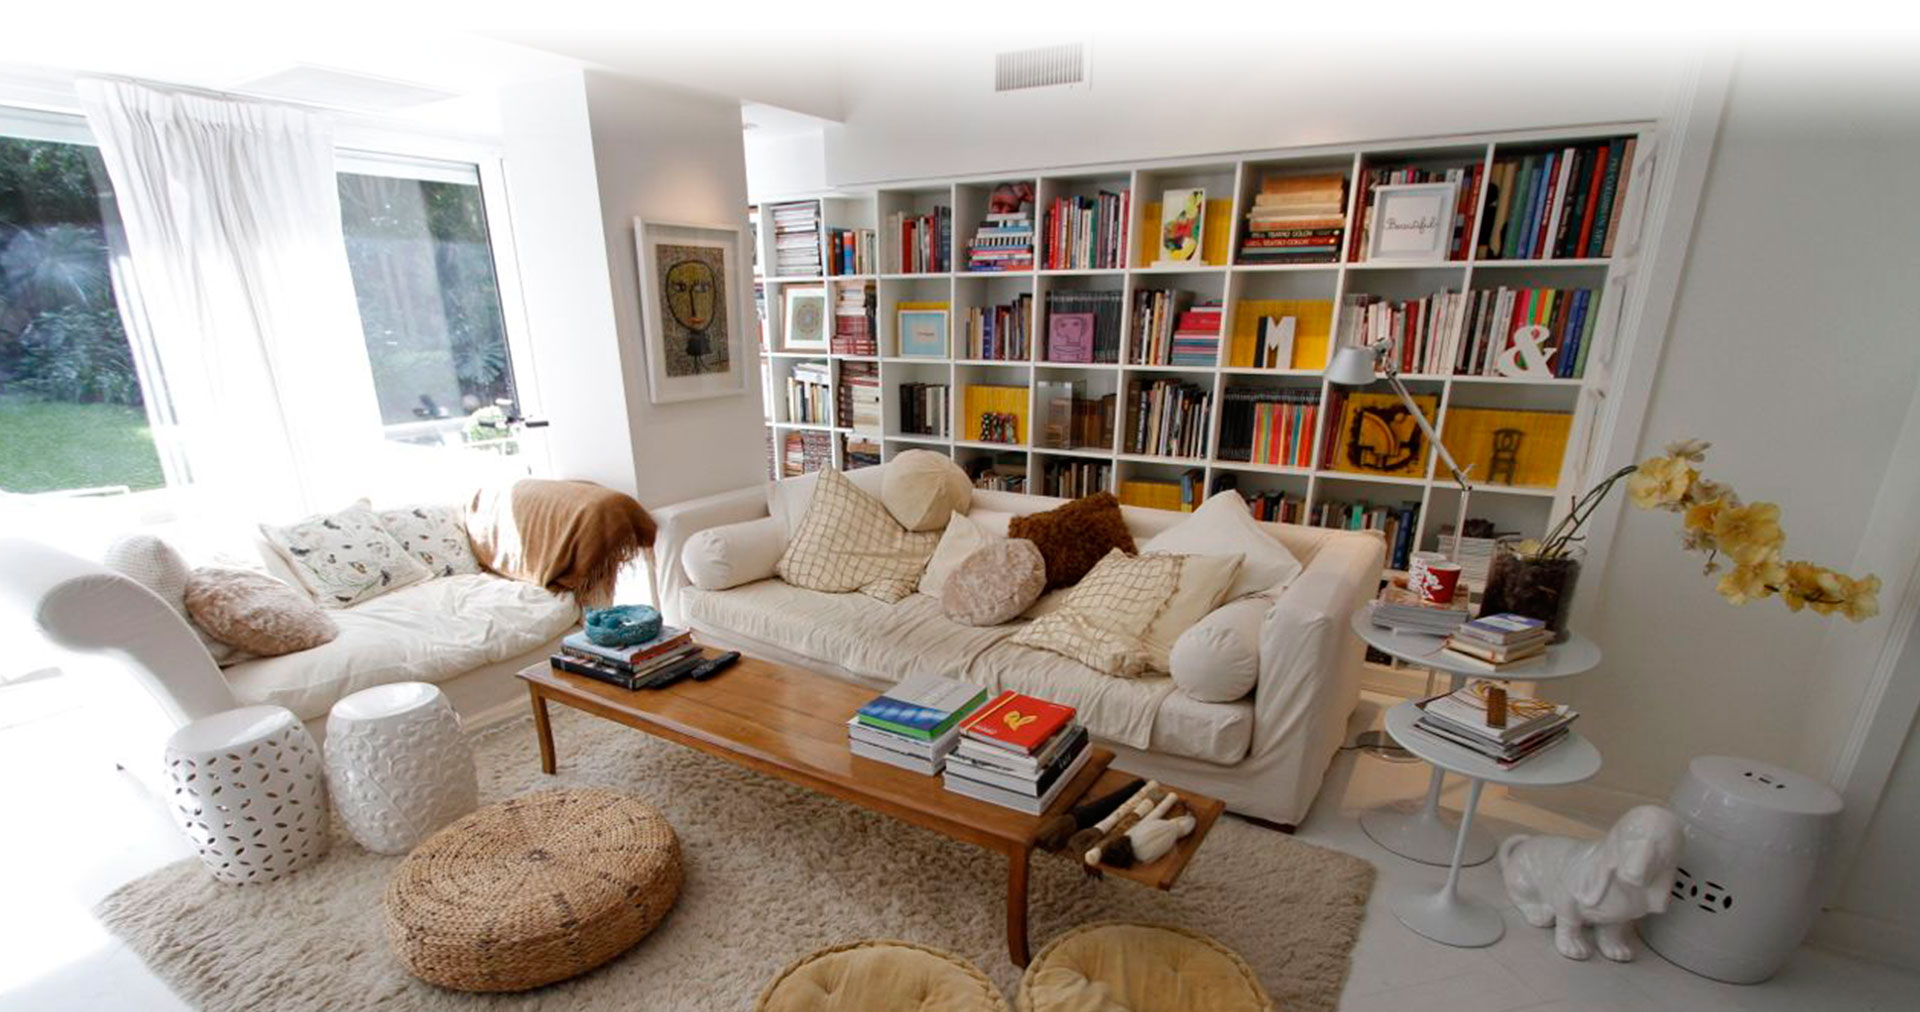 Dise ador interiores carrera home plan - Carrera de arquitectura de interiores ...